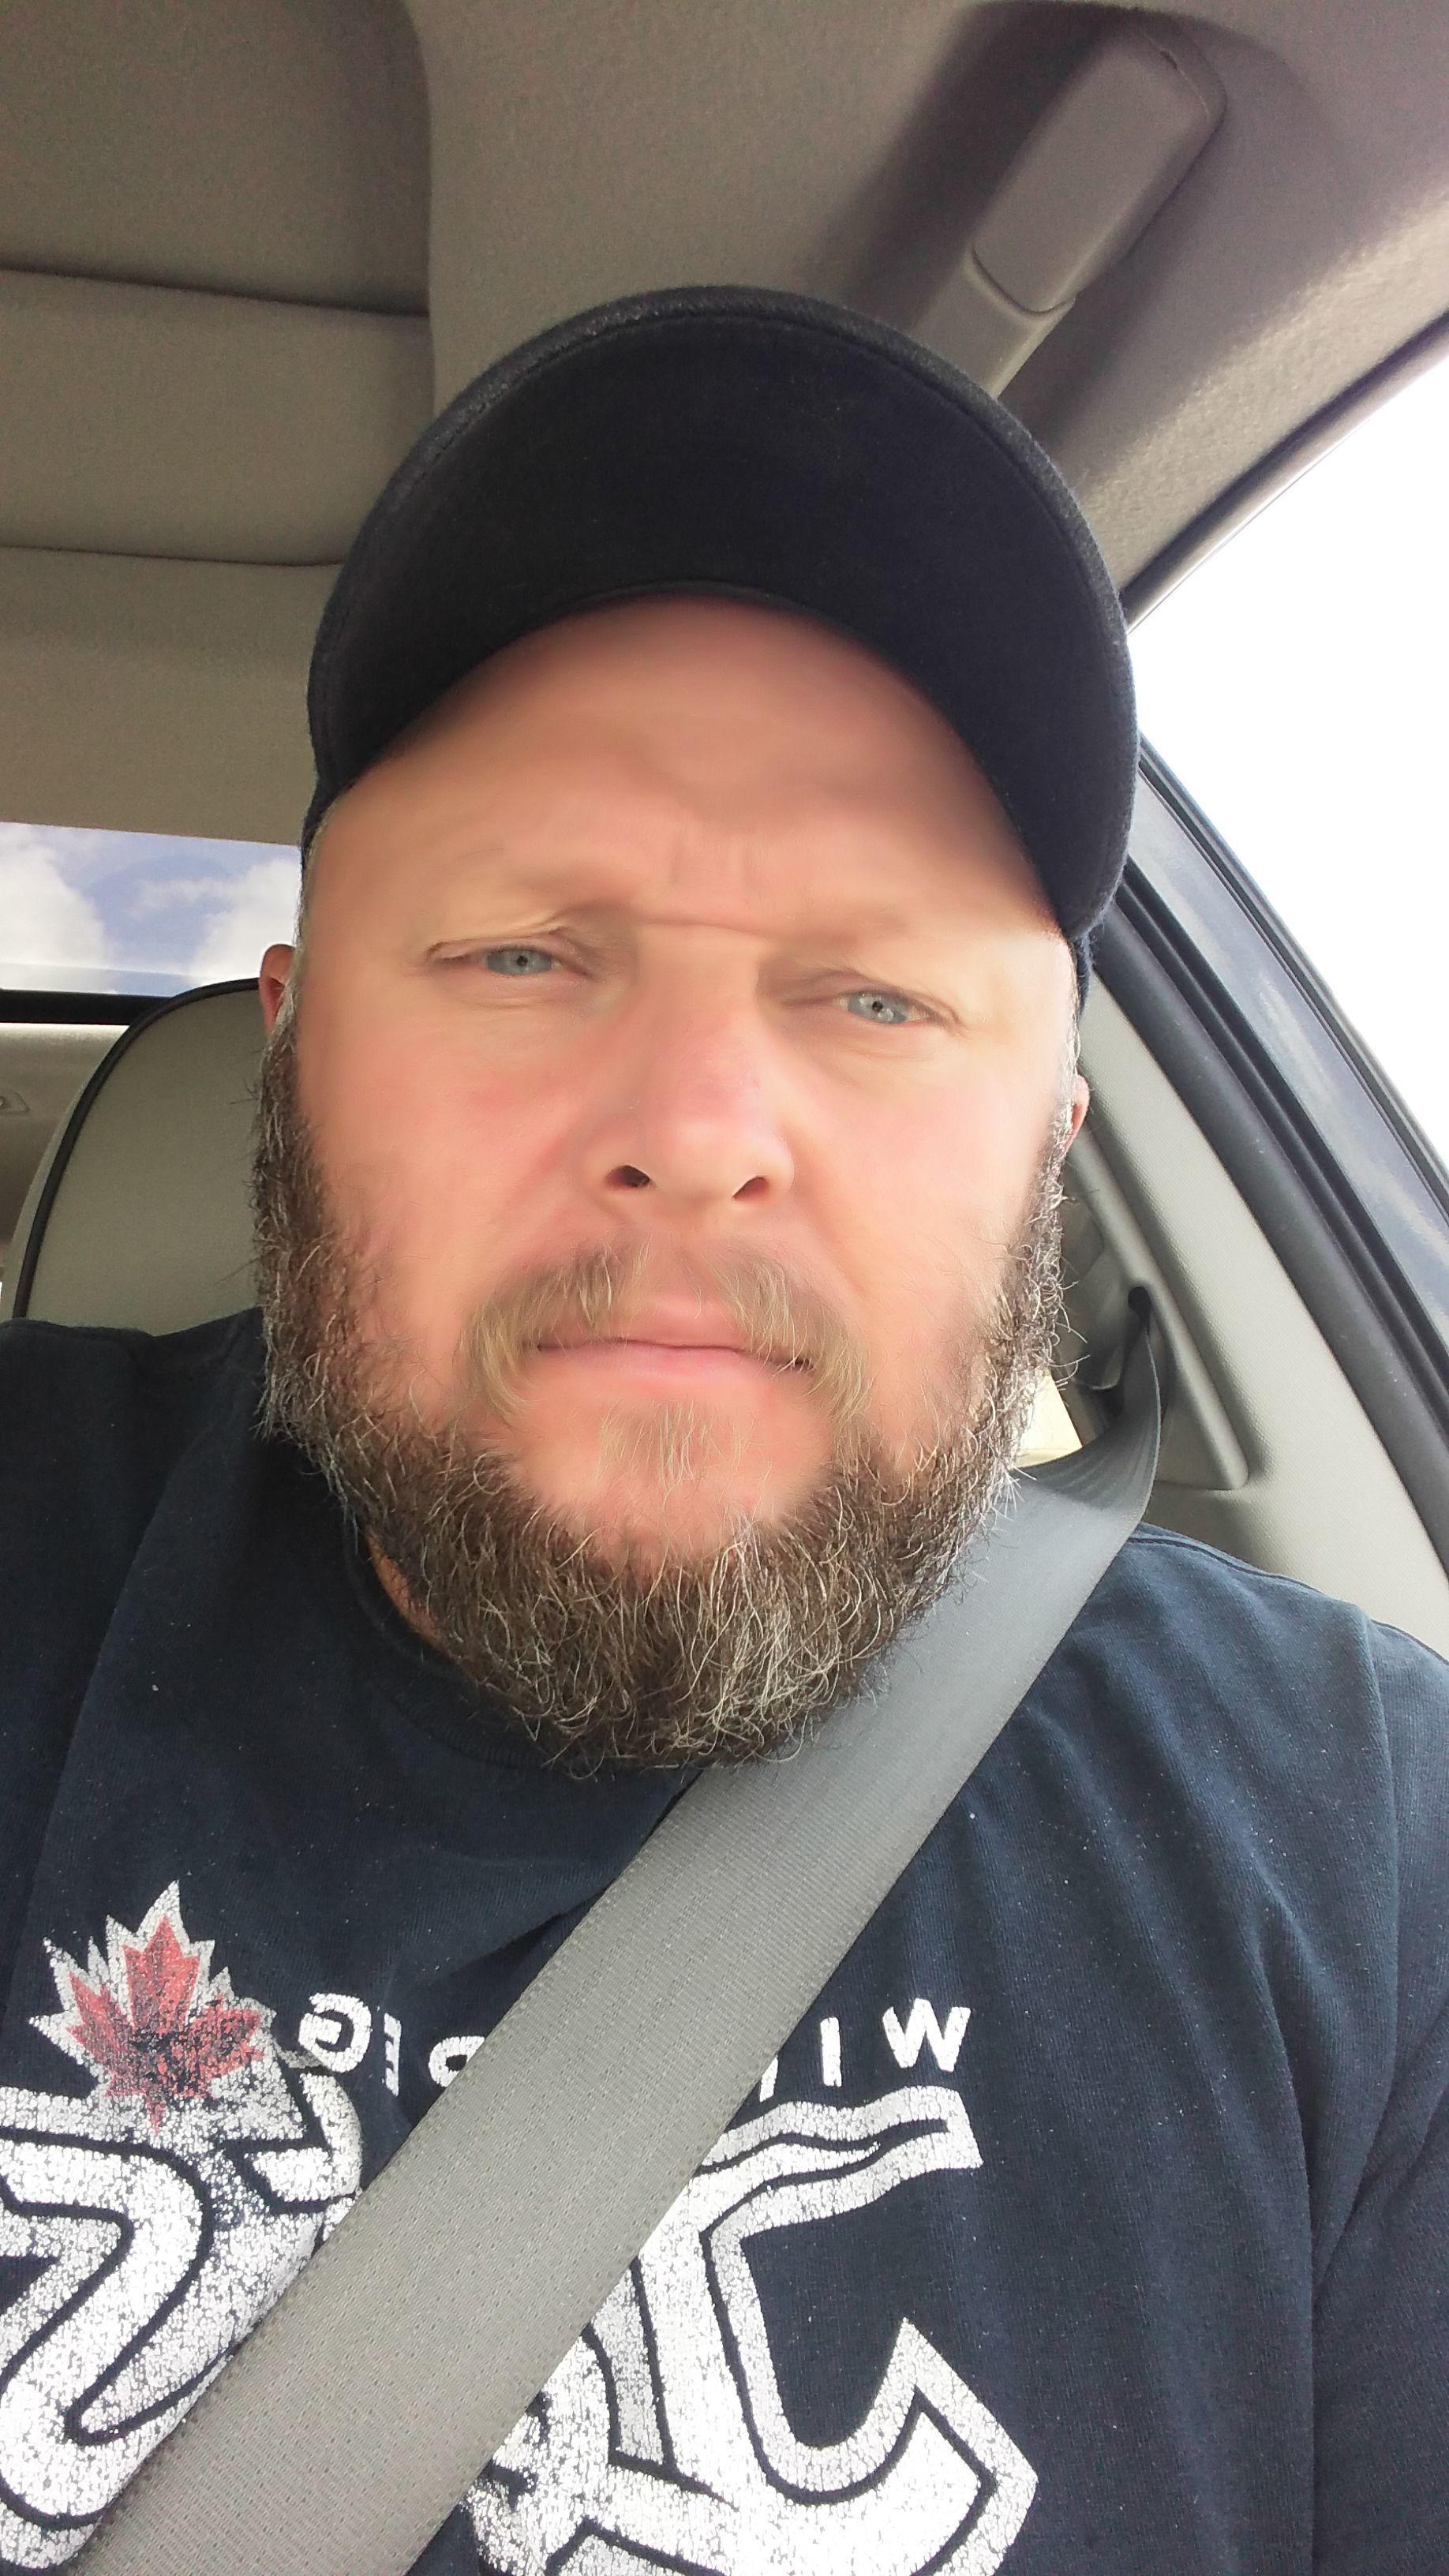 winnipeg single guys Winnipeg gay dating on pridedating   meet gay men and gay women for relationships.